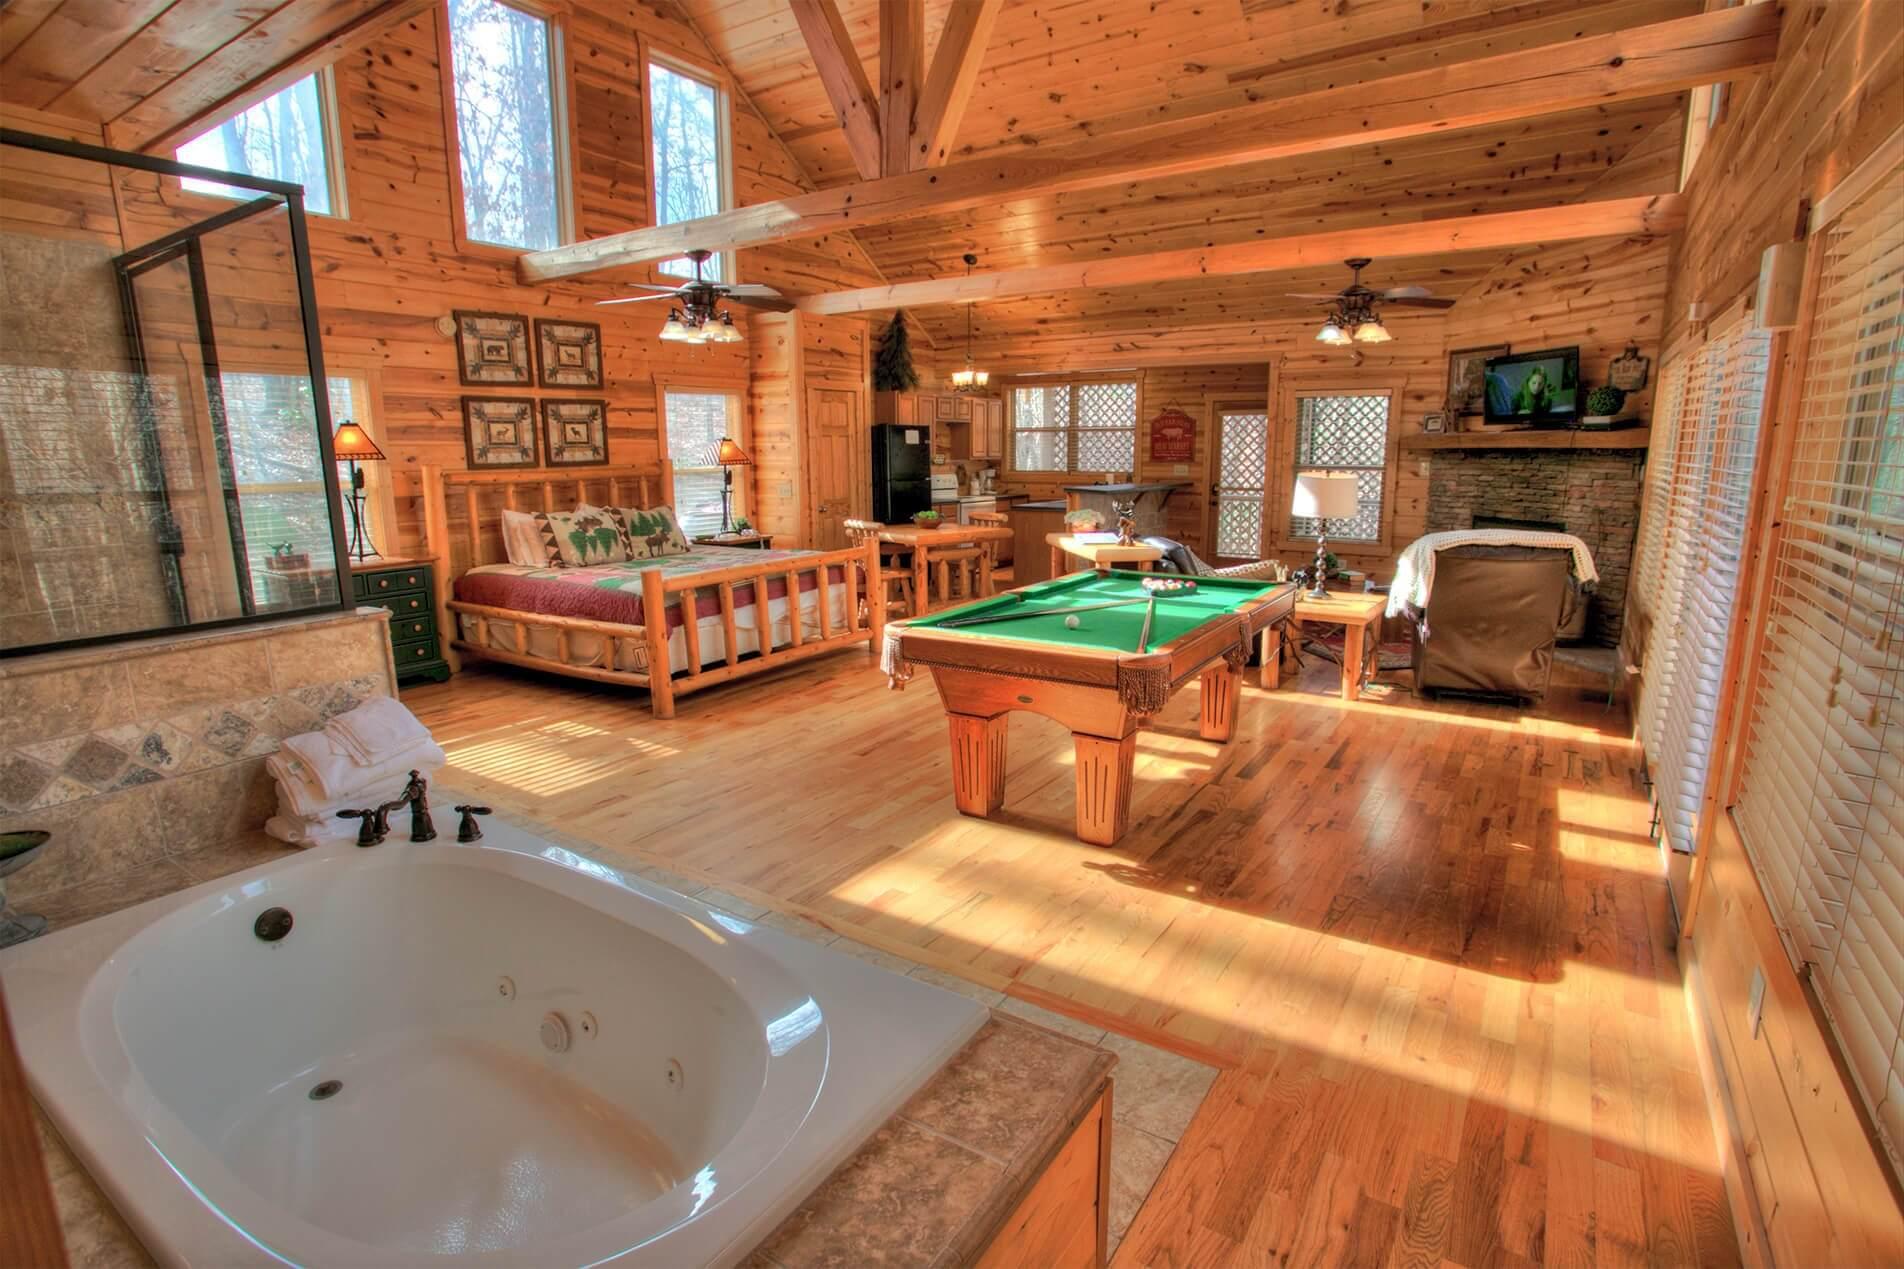 Cabin Getaway For Couples Escape